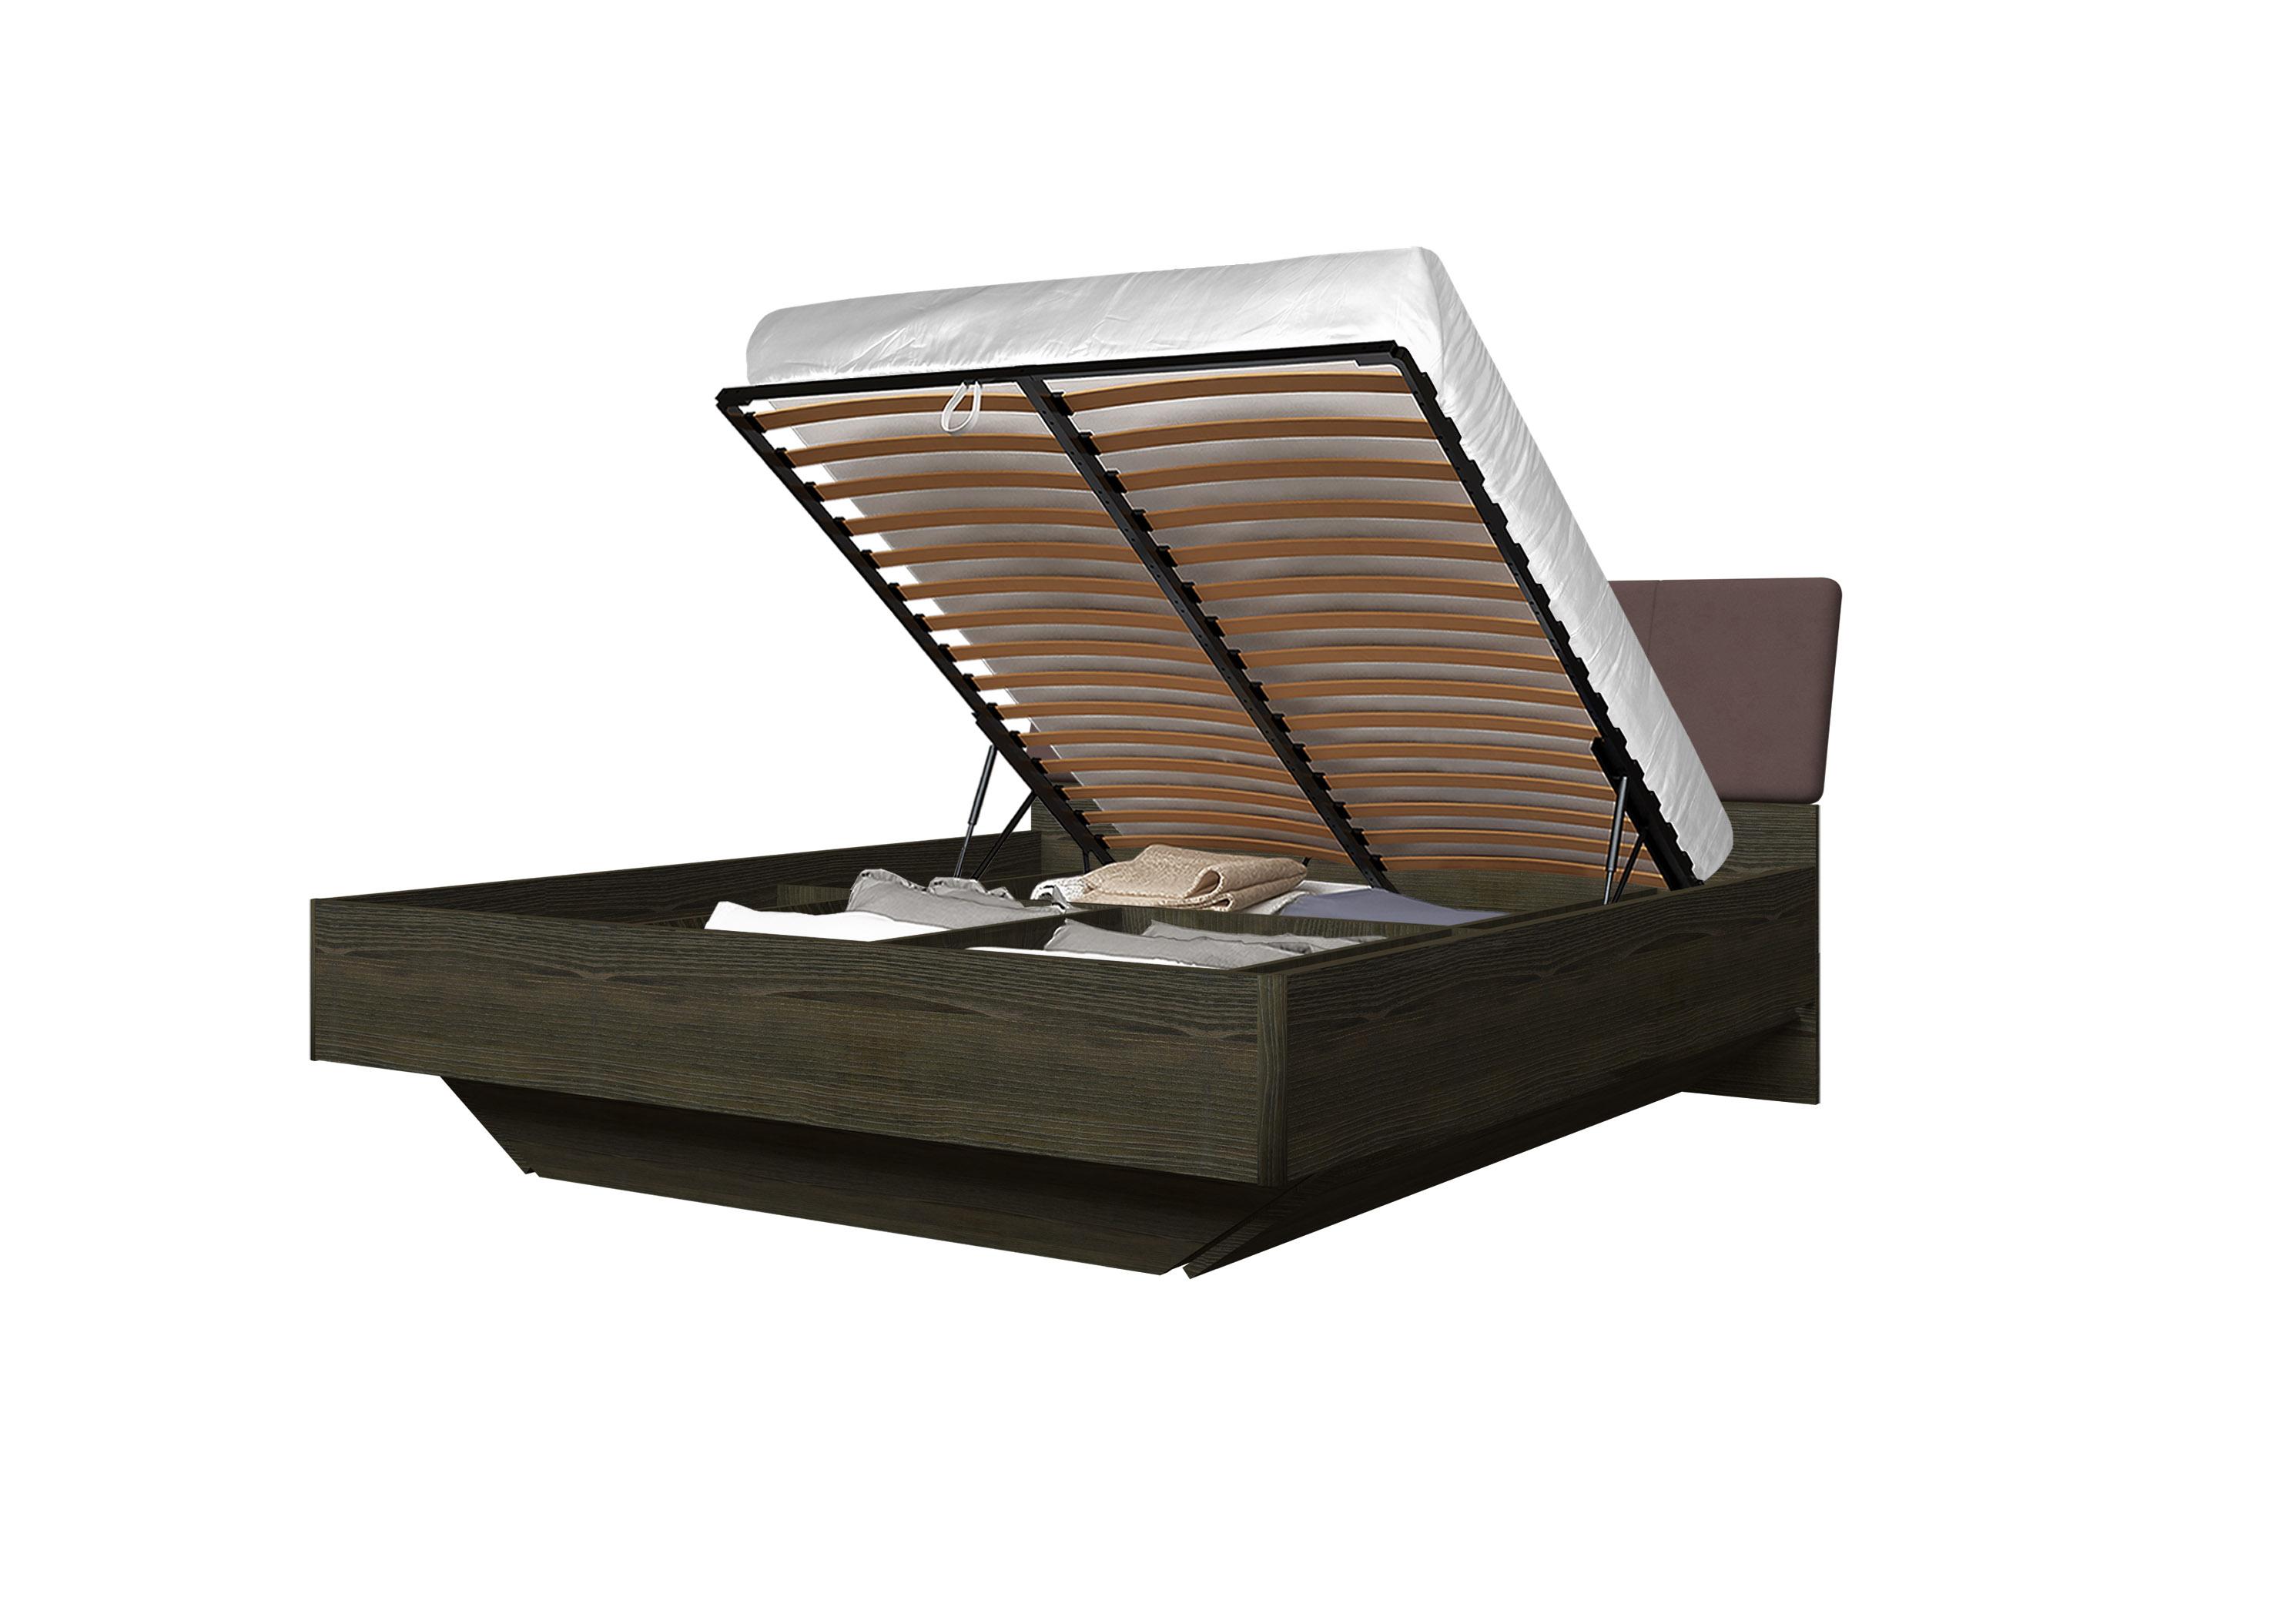 Doppelbett Toskana 180x200 in Dunkle Buche/Braun inkl. Bettkasten